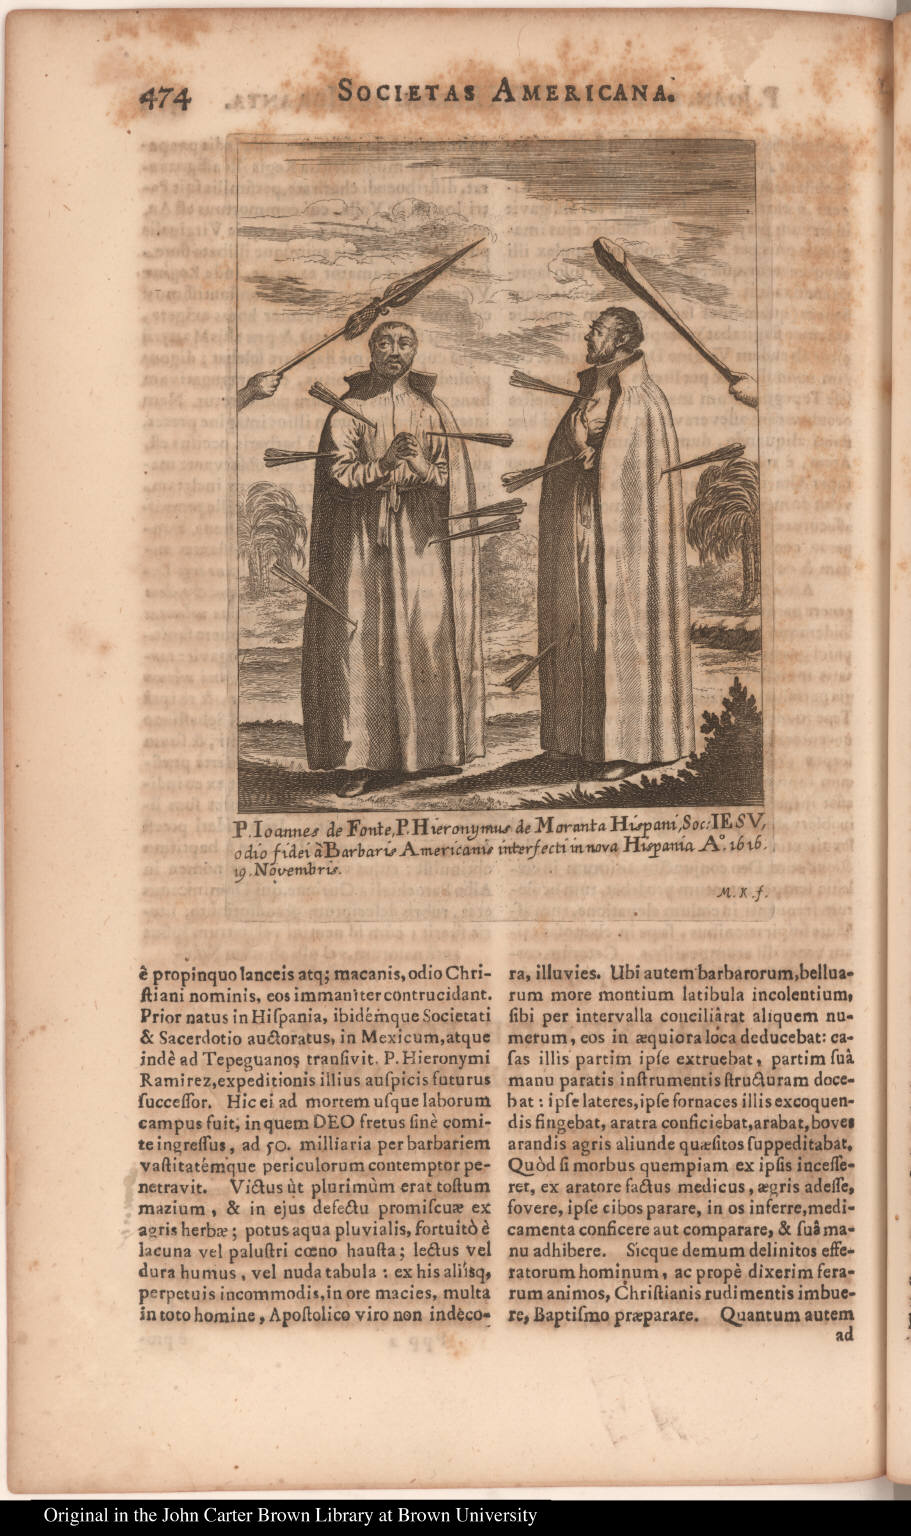 P. Ioannes de Fonte, P. Hieronymus de Moranta Hispani, Soc: Iesu, odio fidei à Barbaris Americanis interfecti in nova Hispania Ao. 1616. 19. Novembris.